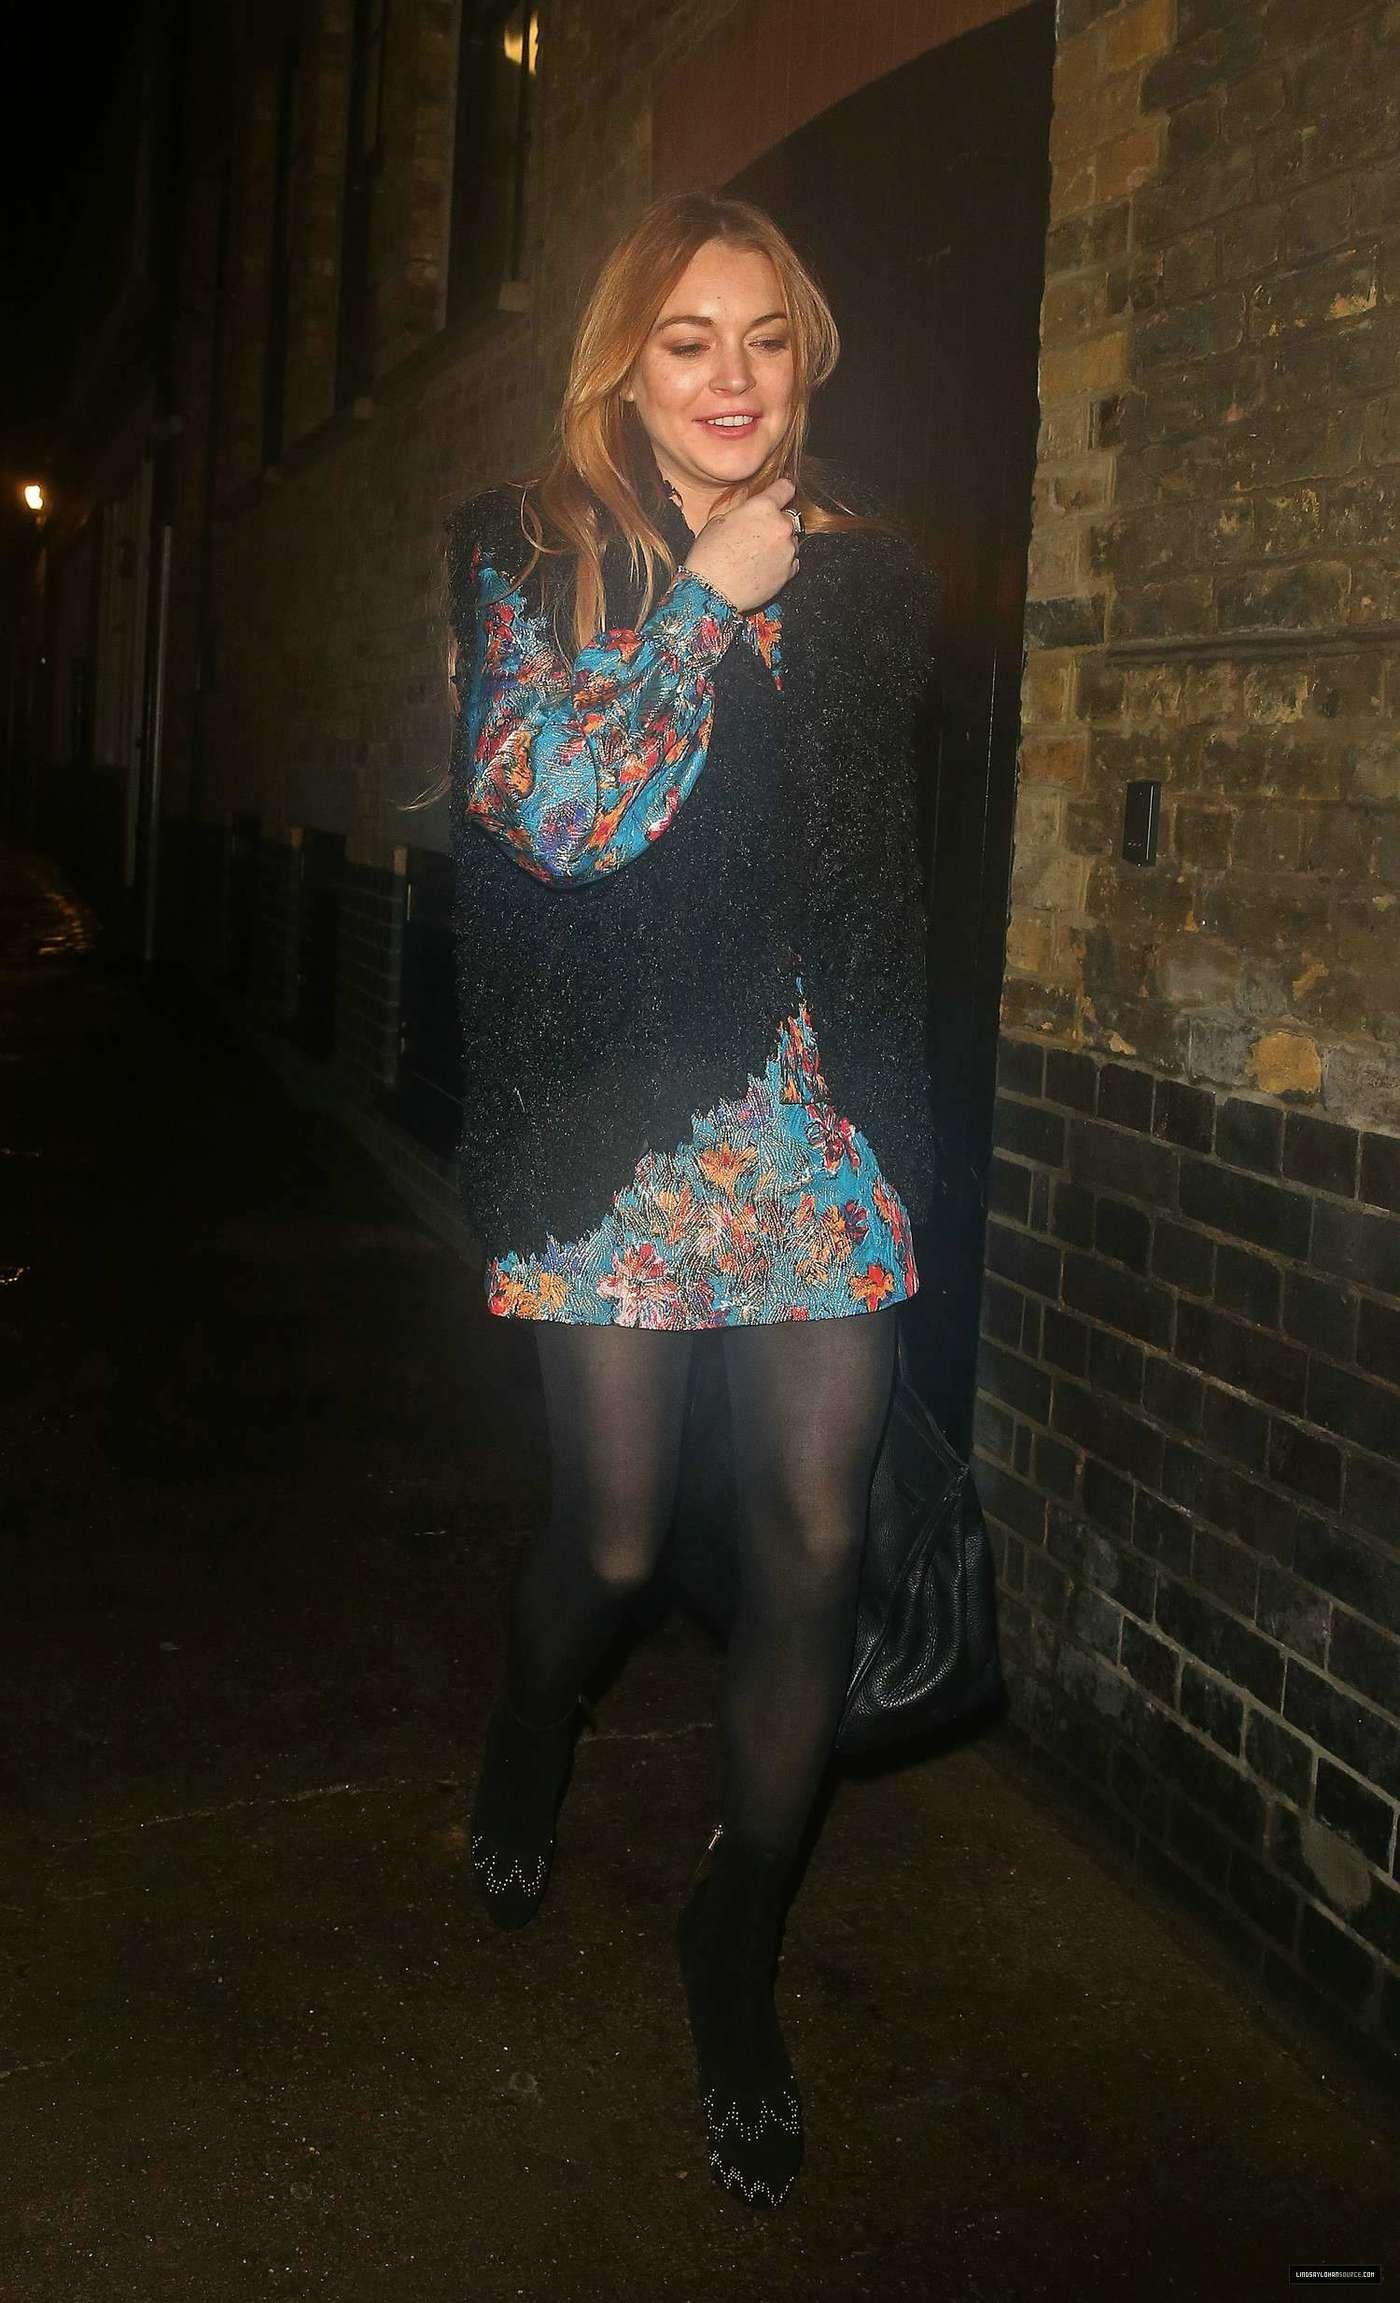 Lindsay Lohan 2014 : Lindsay Lohan in Mini Dress Leaves the Chiltern Firehouse -11